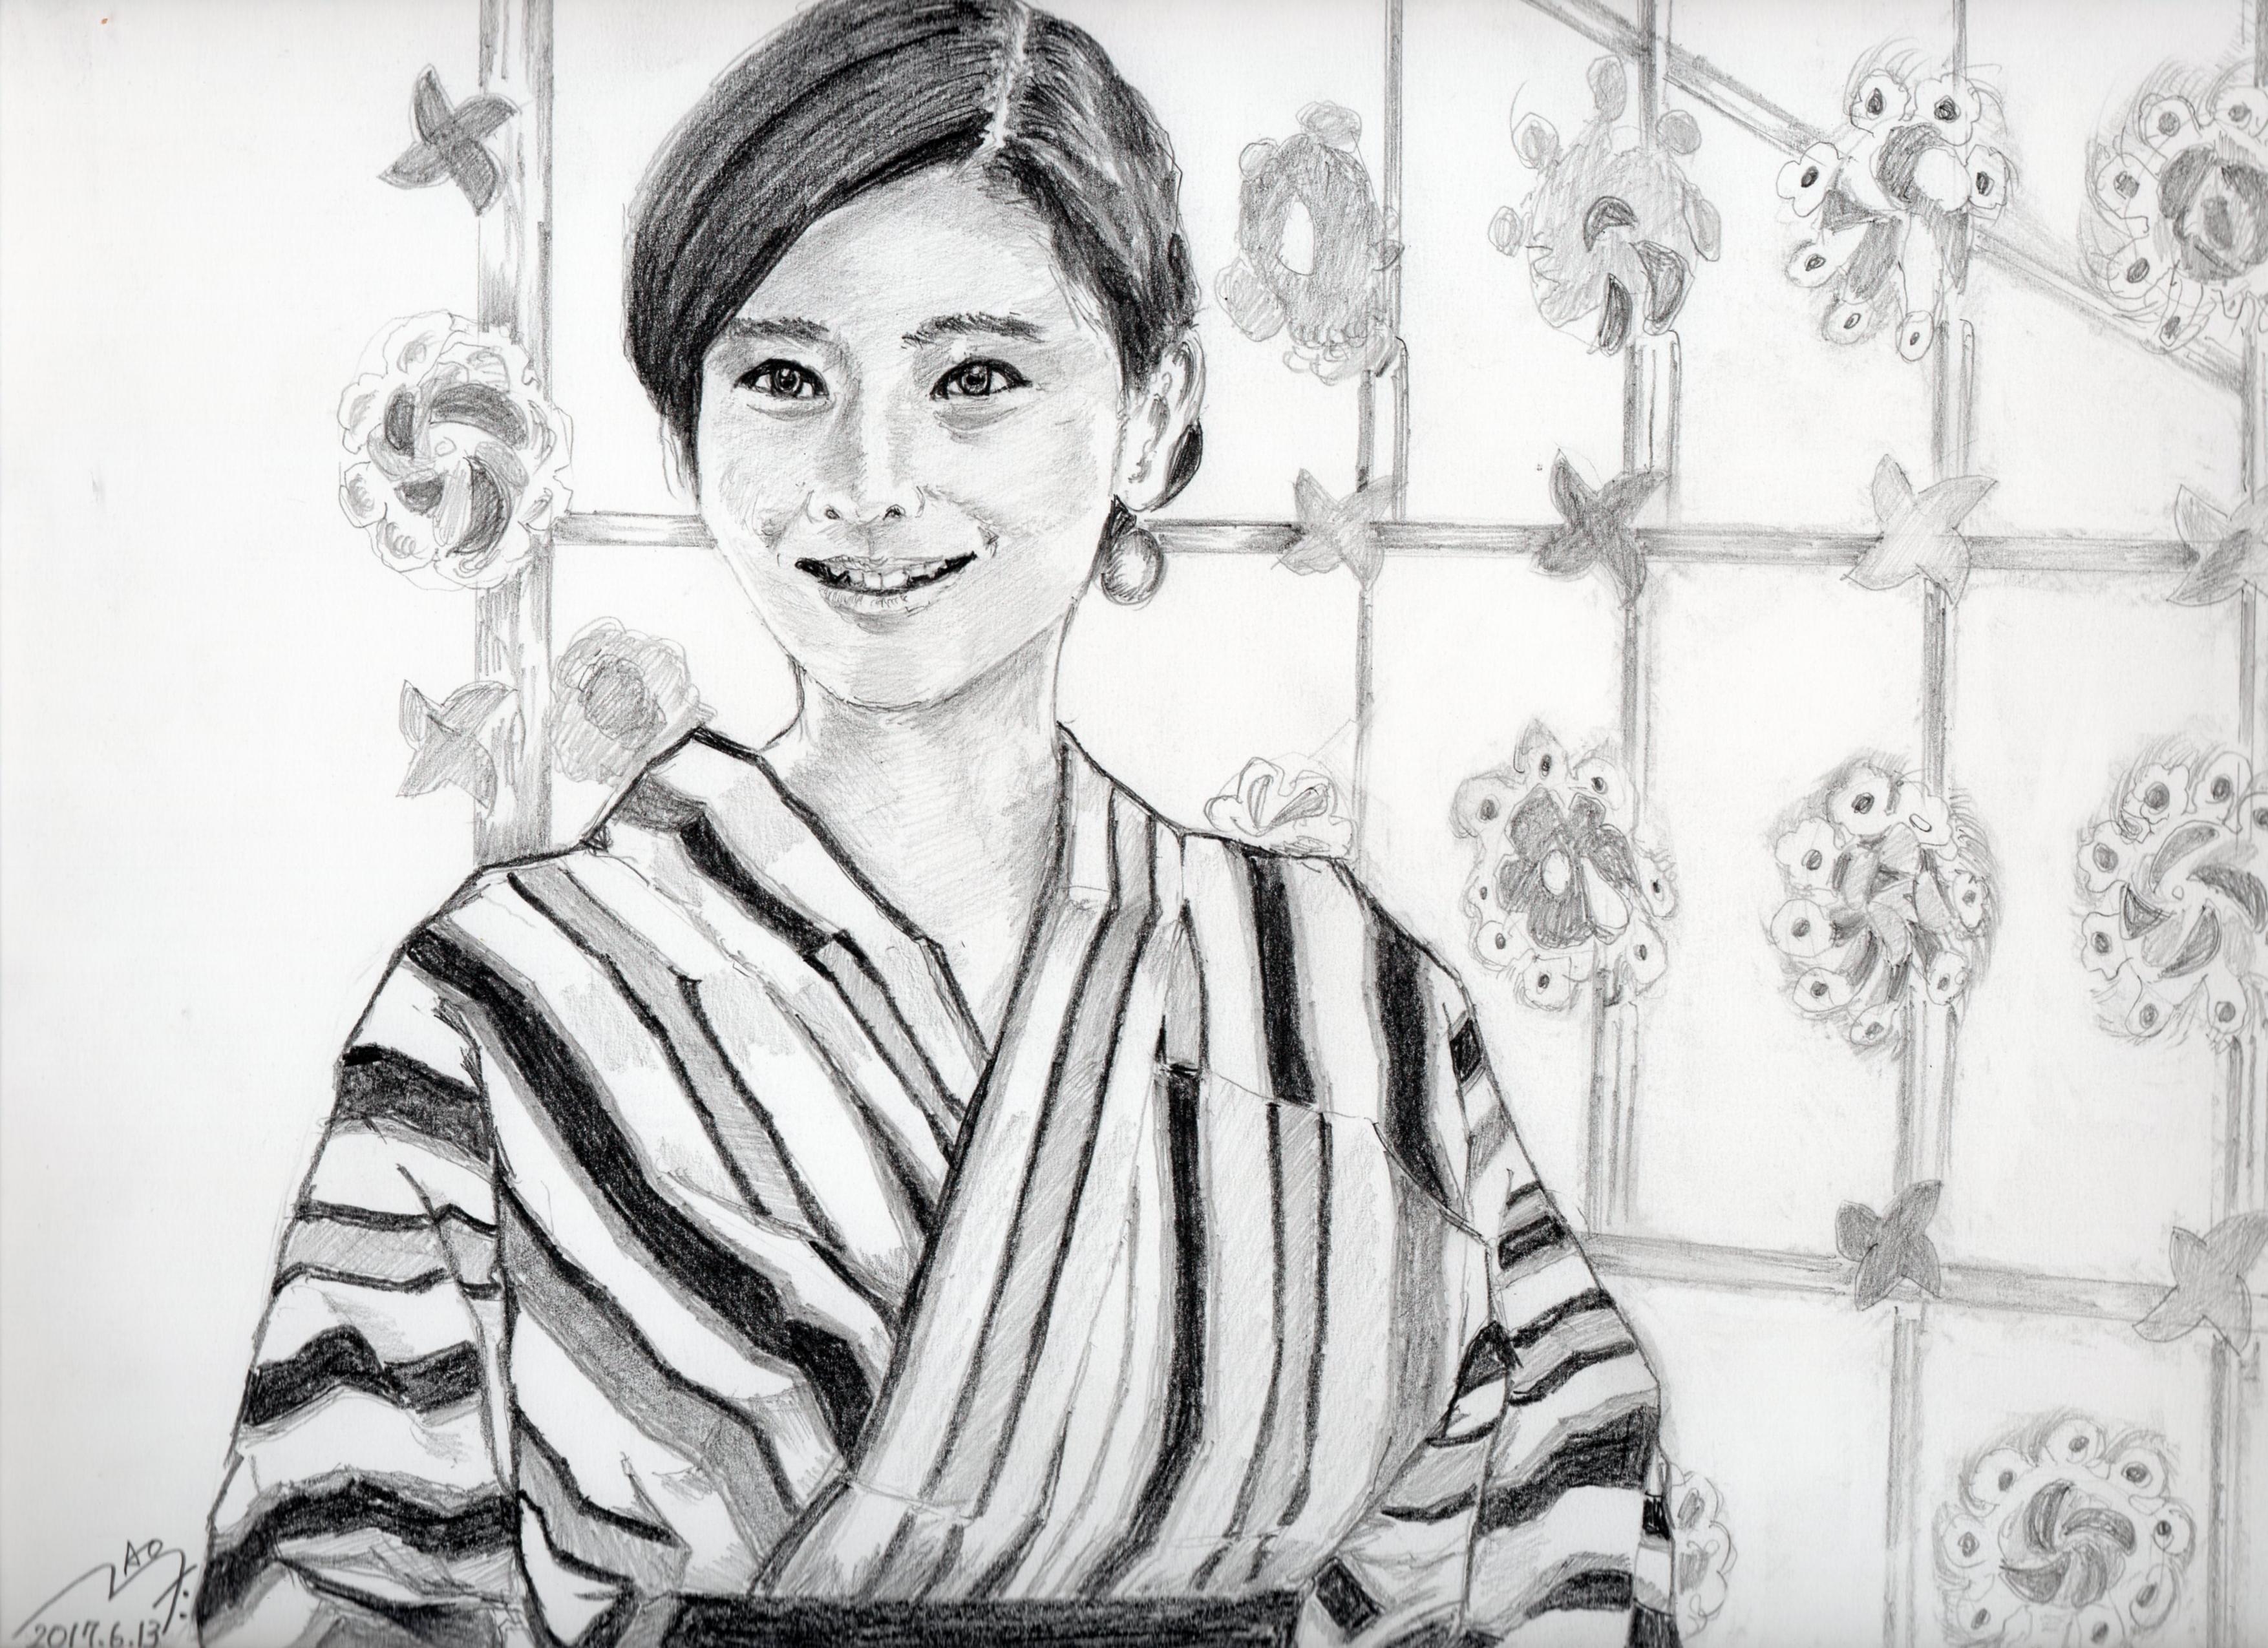 篠原涼子の鉛筆画似顔絵